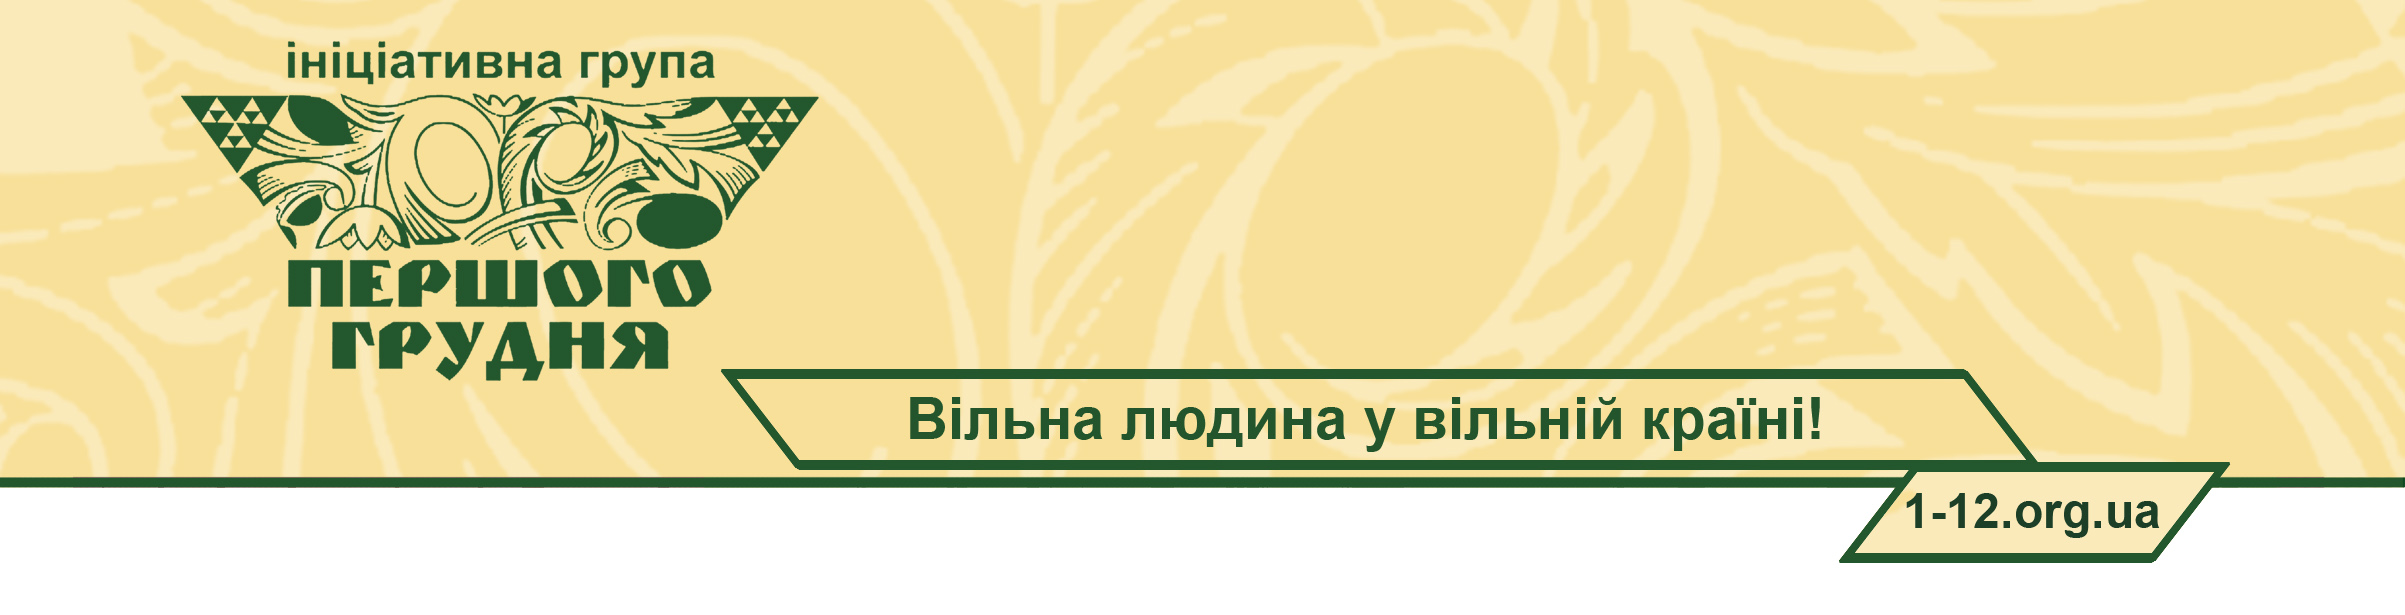 blank1-12-ua-jp